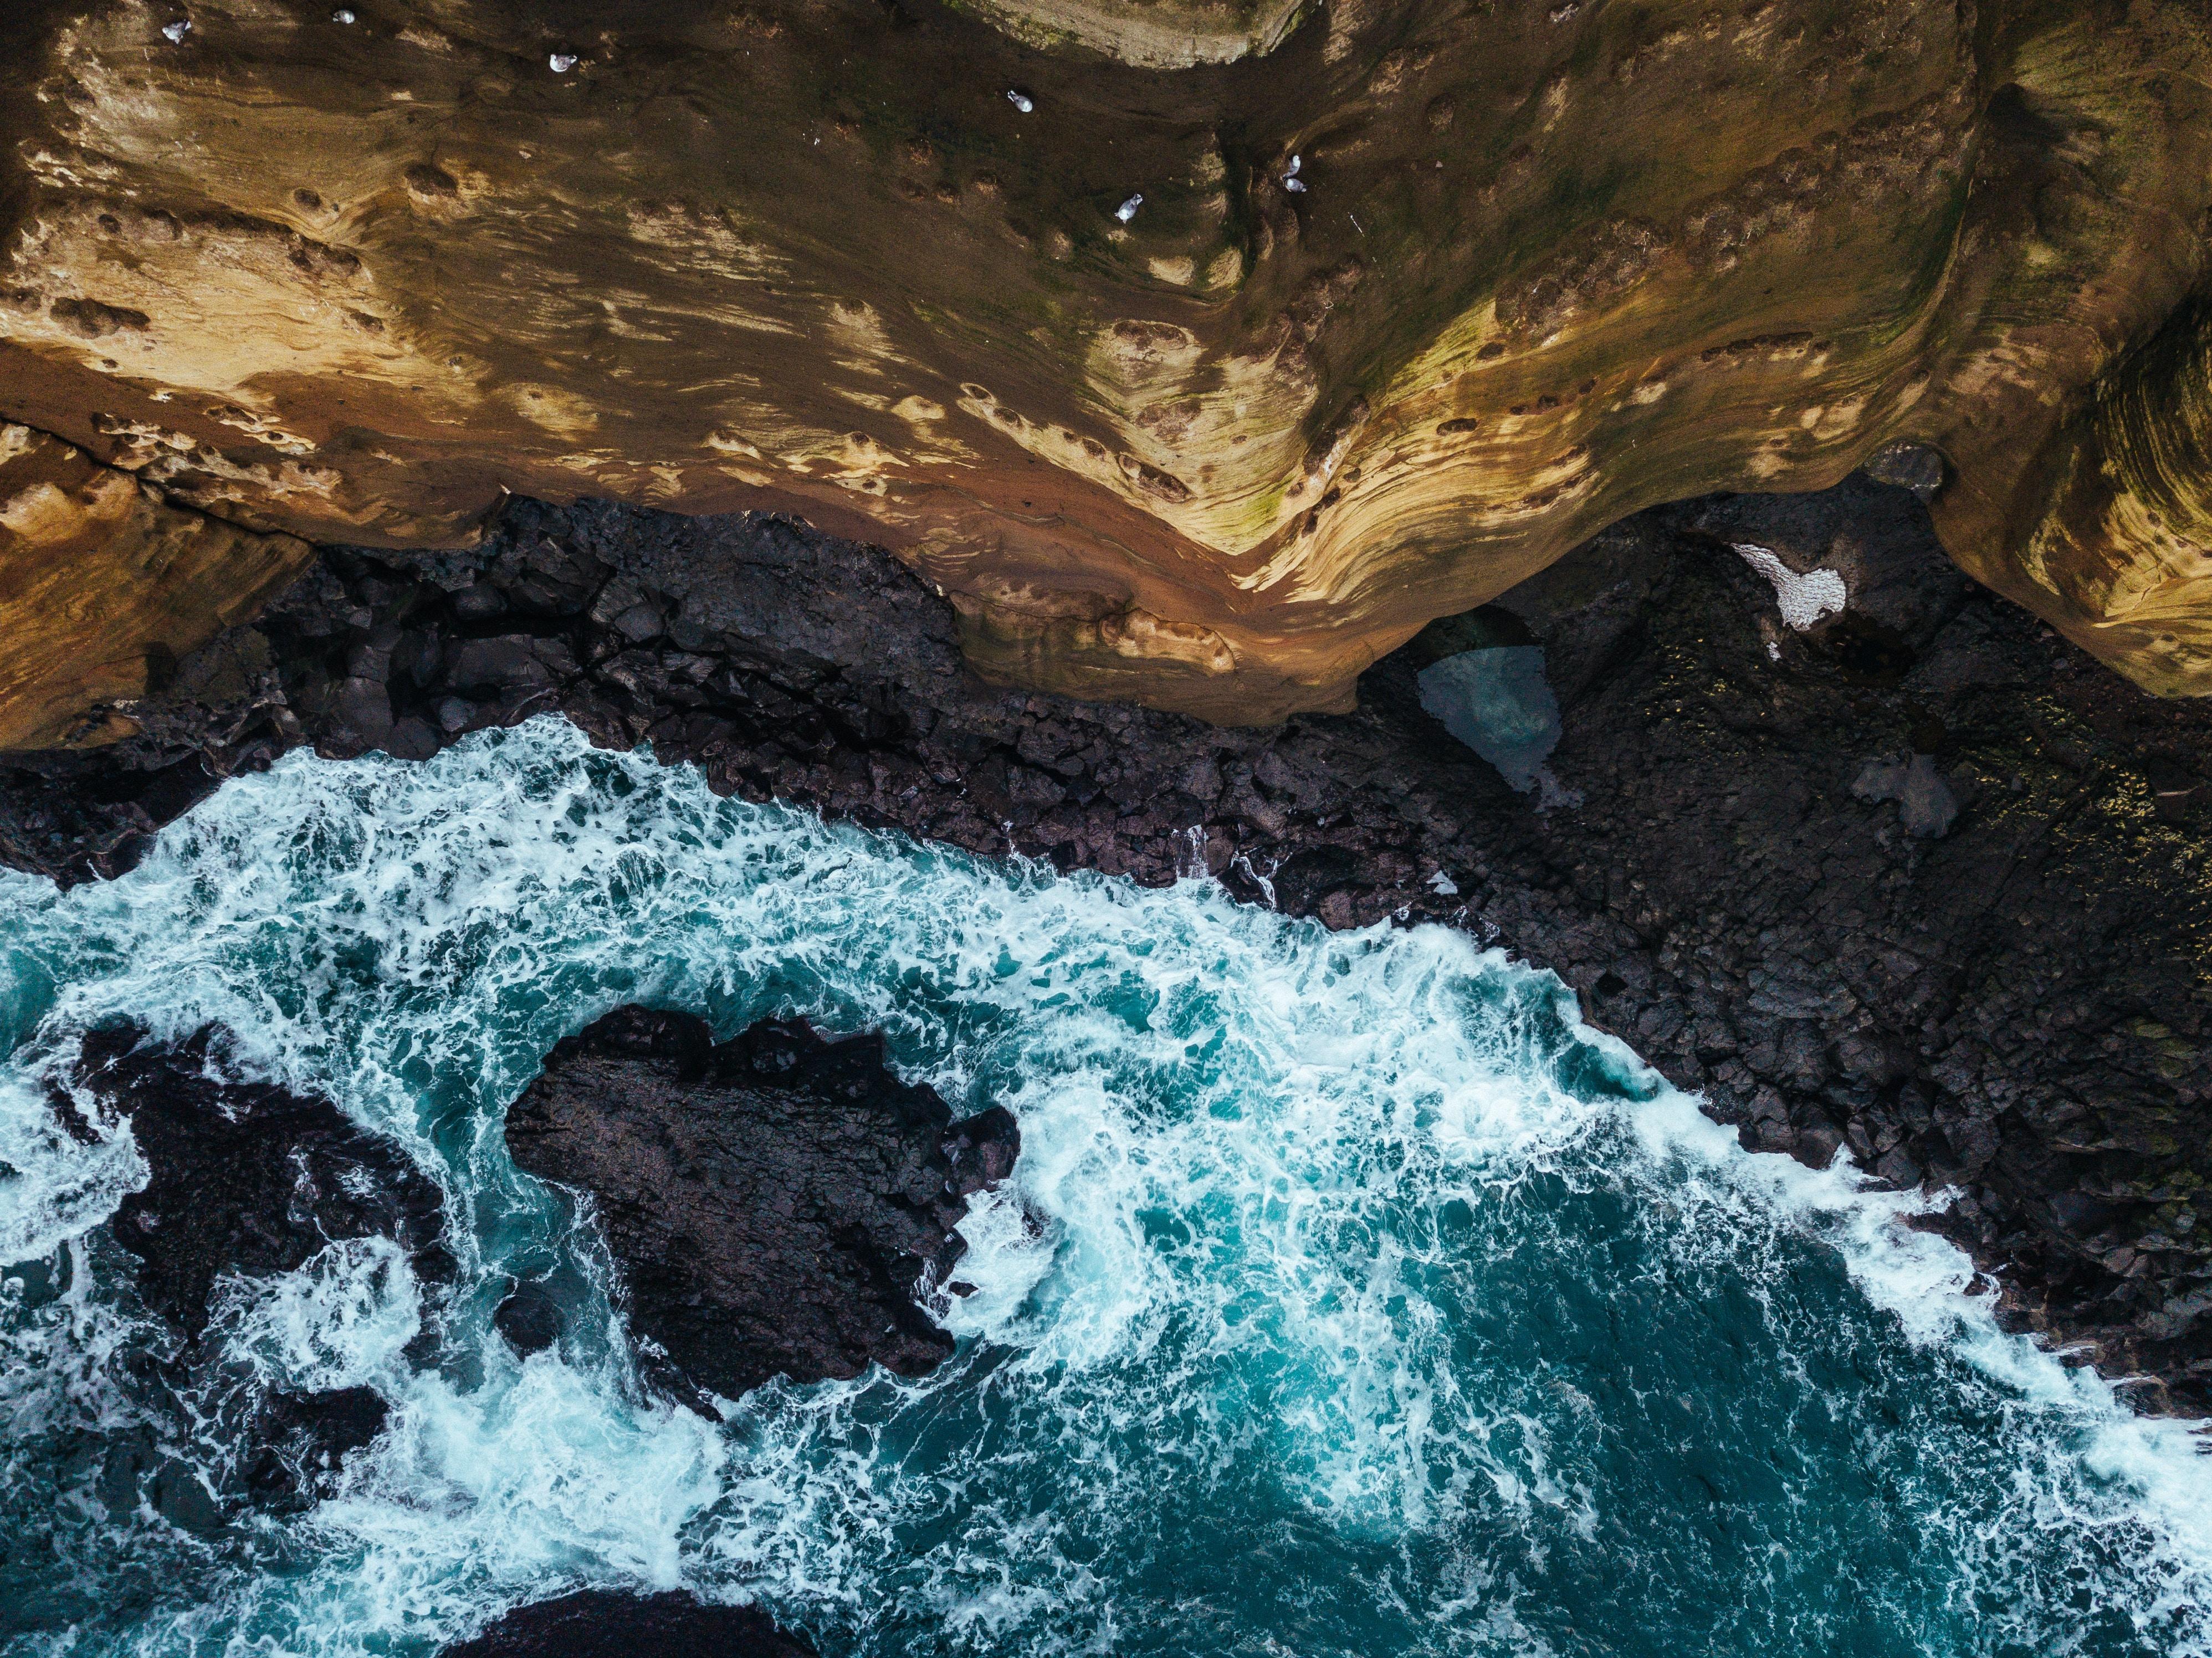 top-view photography of waves crashing on black rocks at daytime